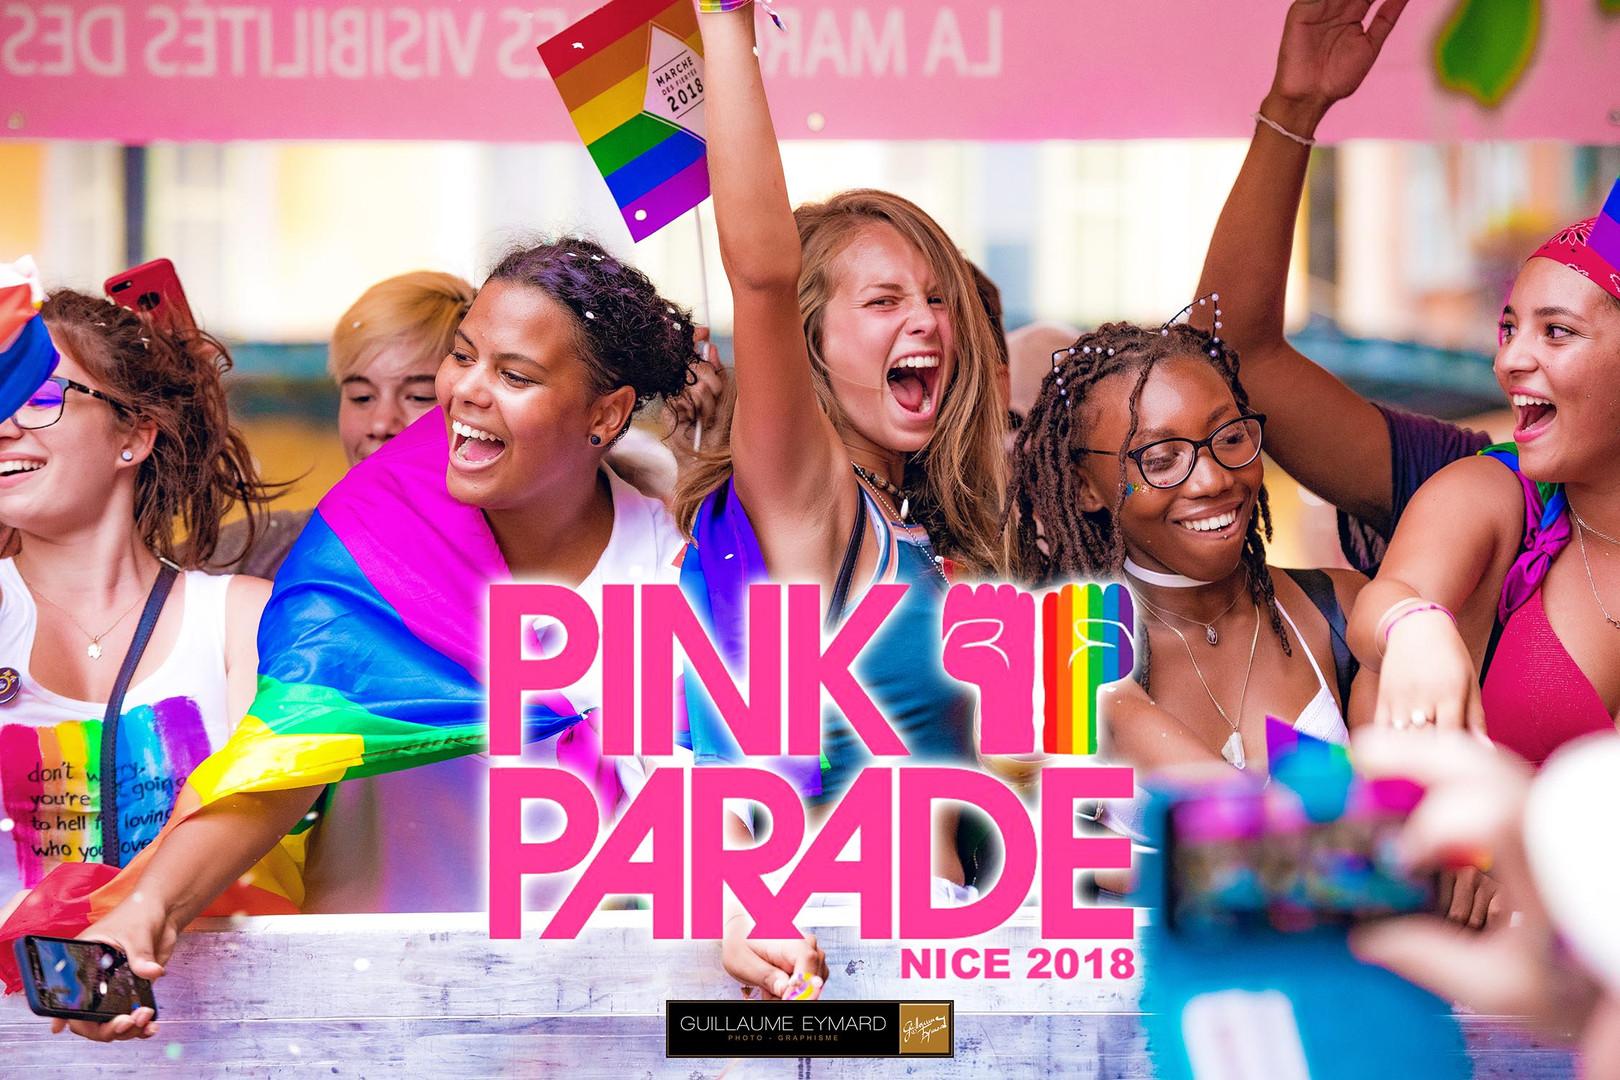 Pink Parade Gay pride nice